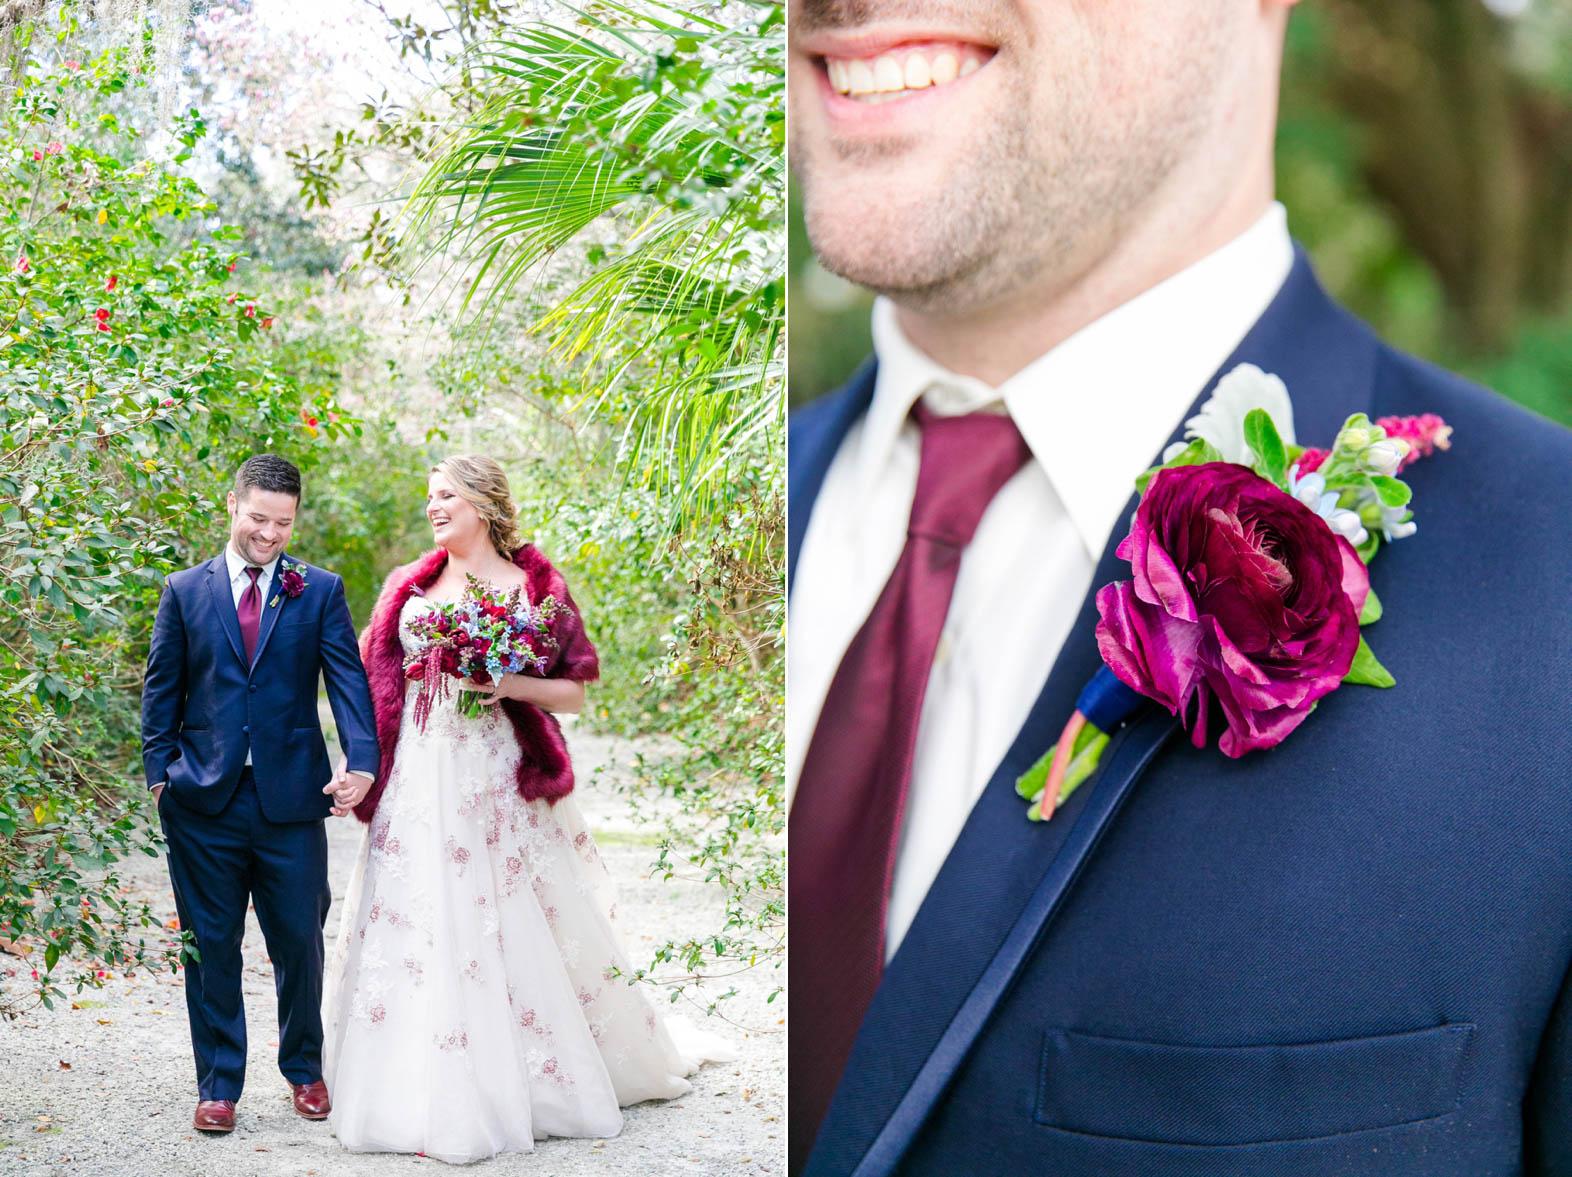 Jennie  Jonathan  Navy  Burgundy Winter Wedding at Magnolia Plantation  Dana Cubbage